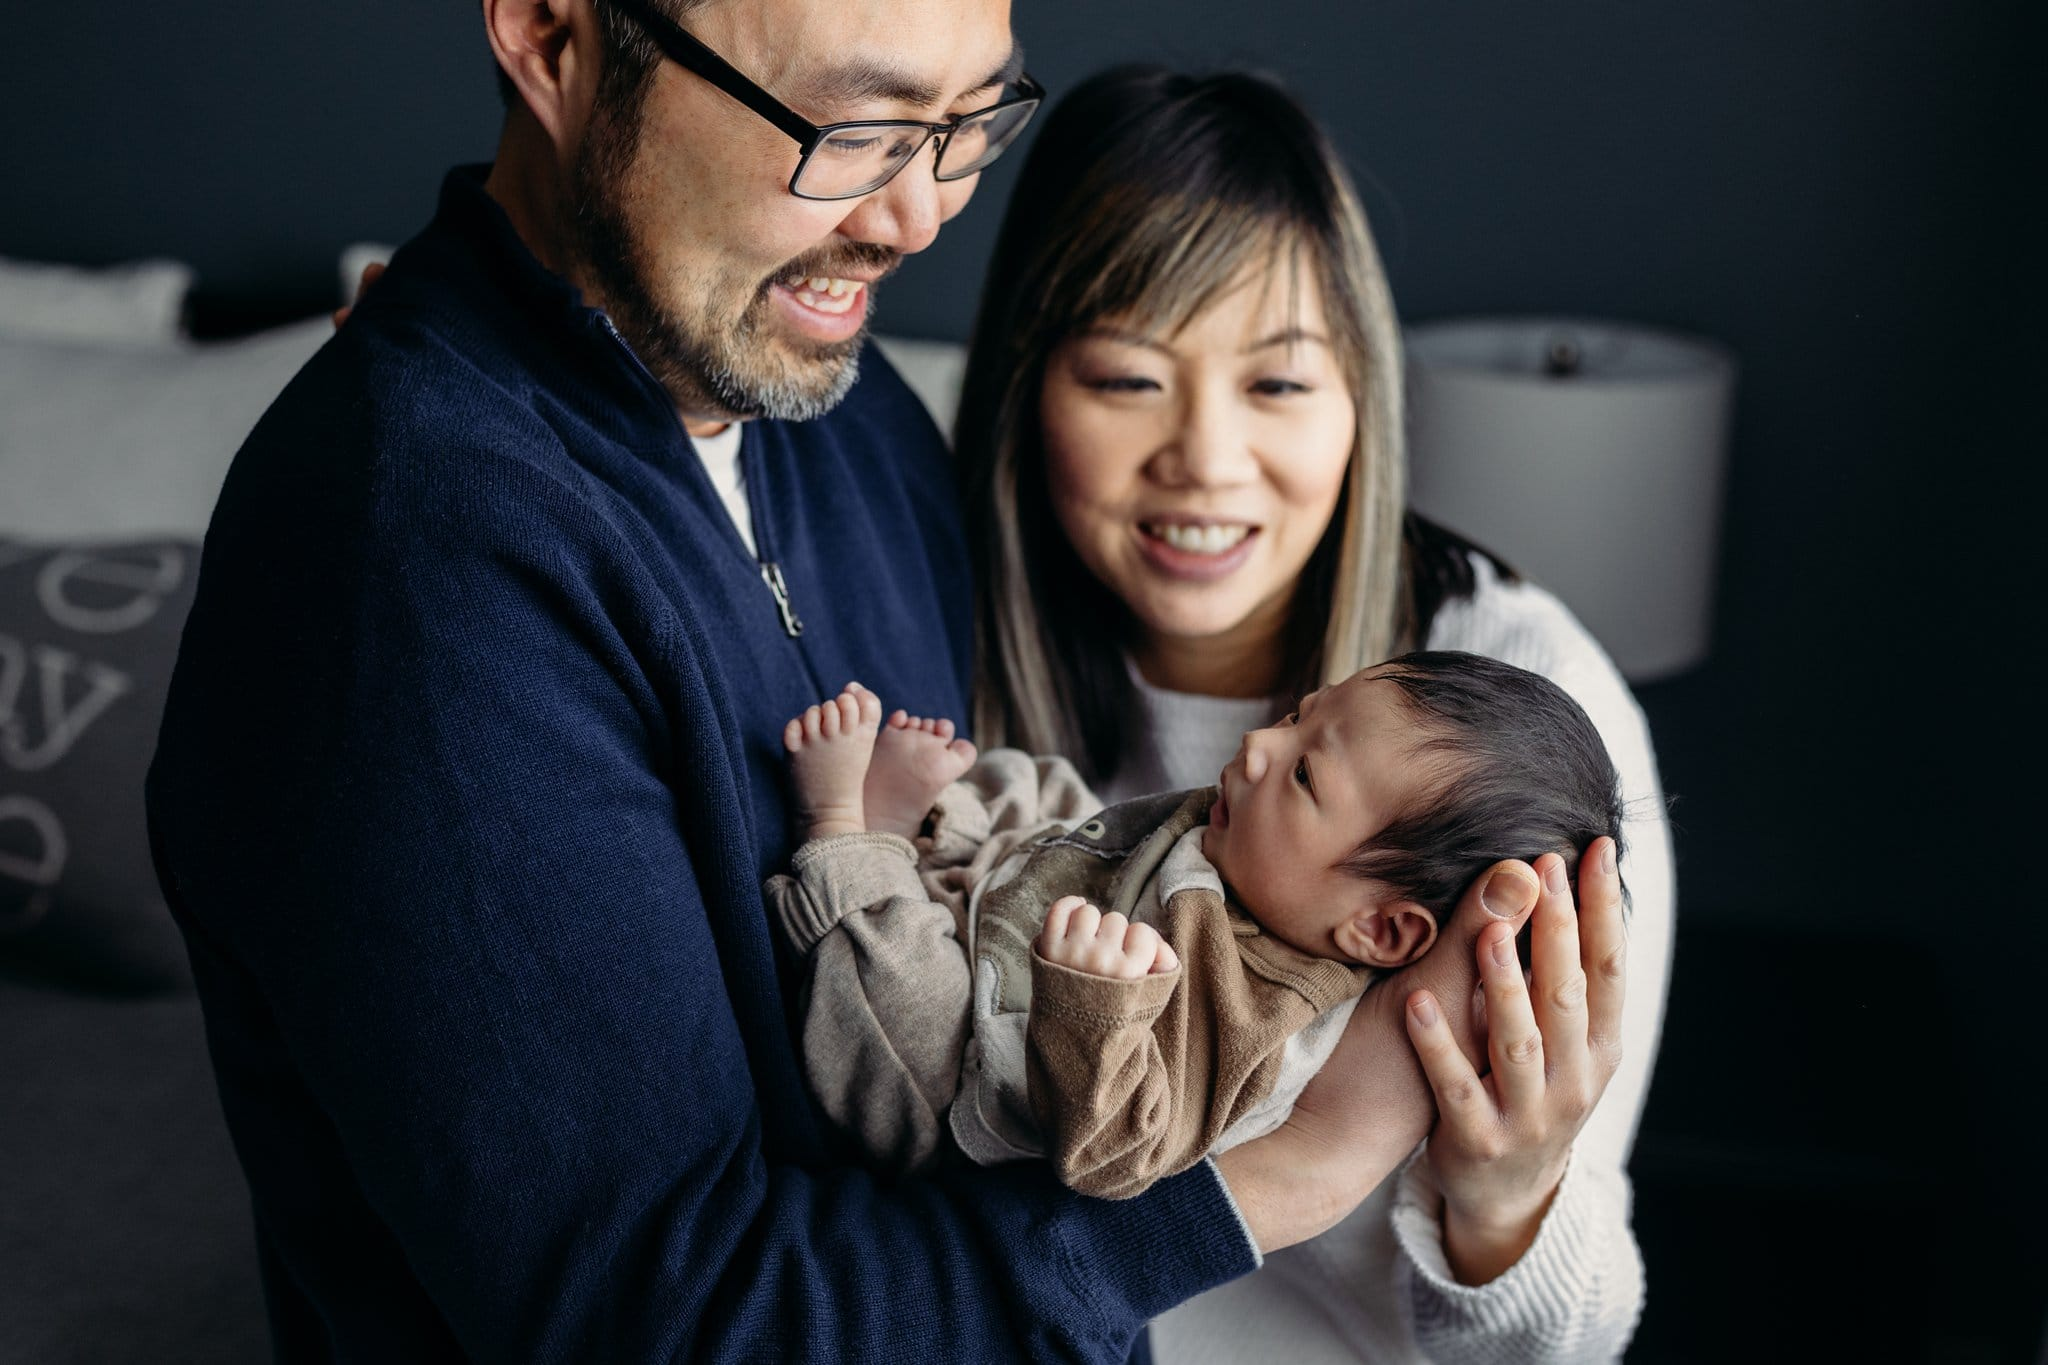 Ashley Daphne Photography Calgary Family Photographer Newborn Lifestyle Photos_0071.jpg